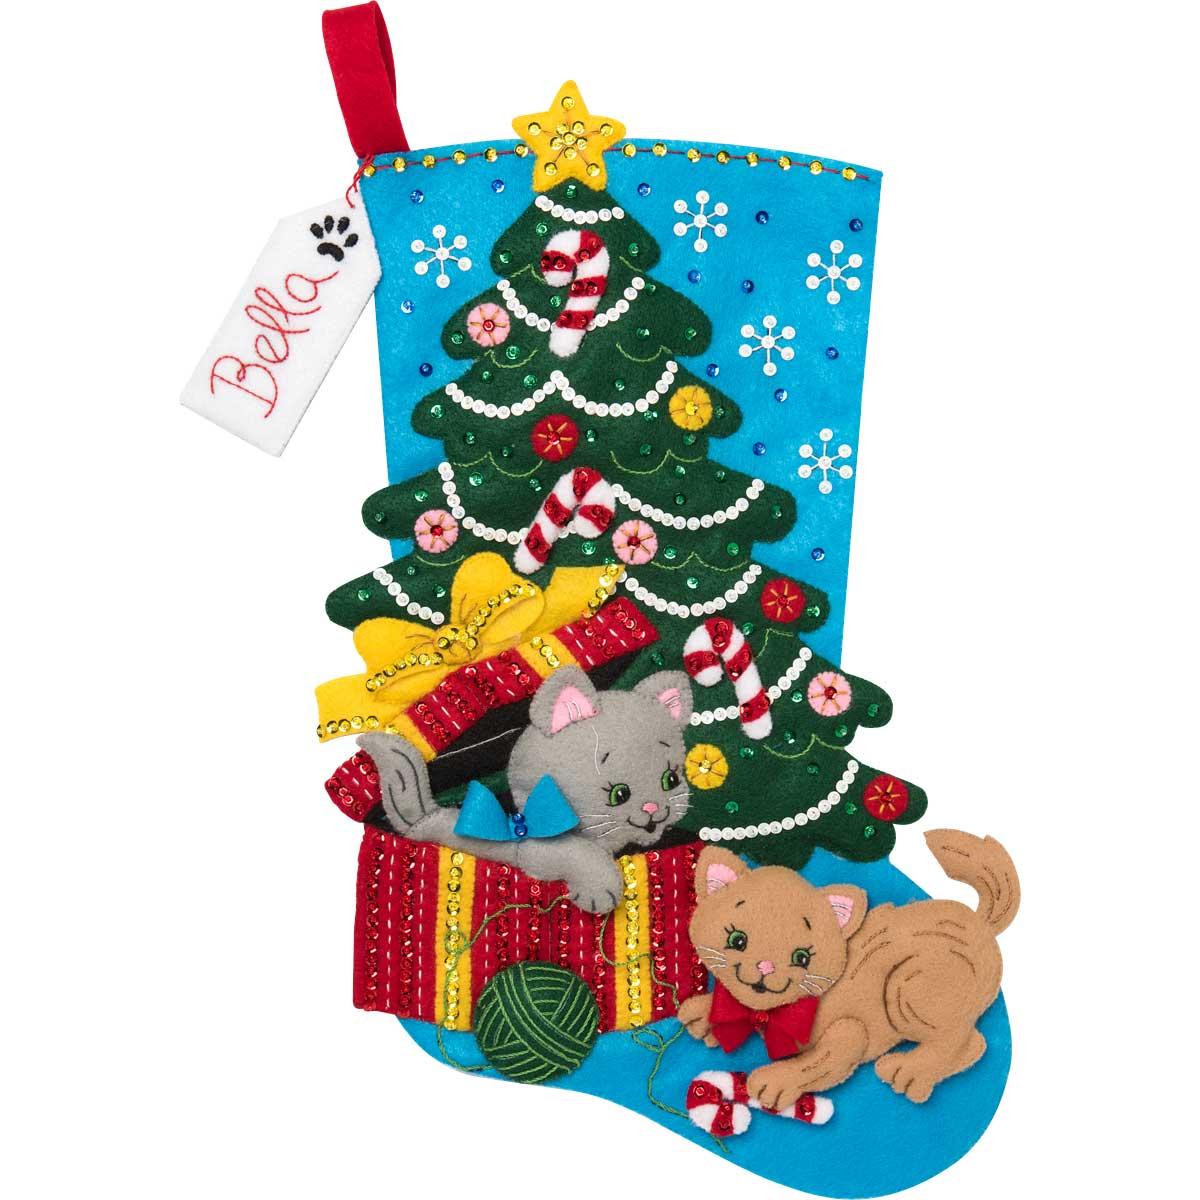 Bucilla ® Seasonal - Felt - Stocking Kits - The Pawfect Gift